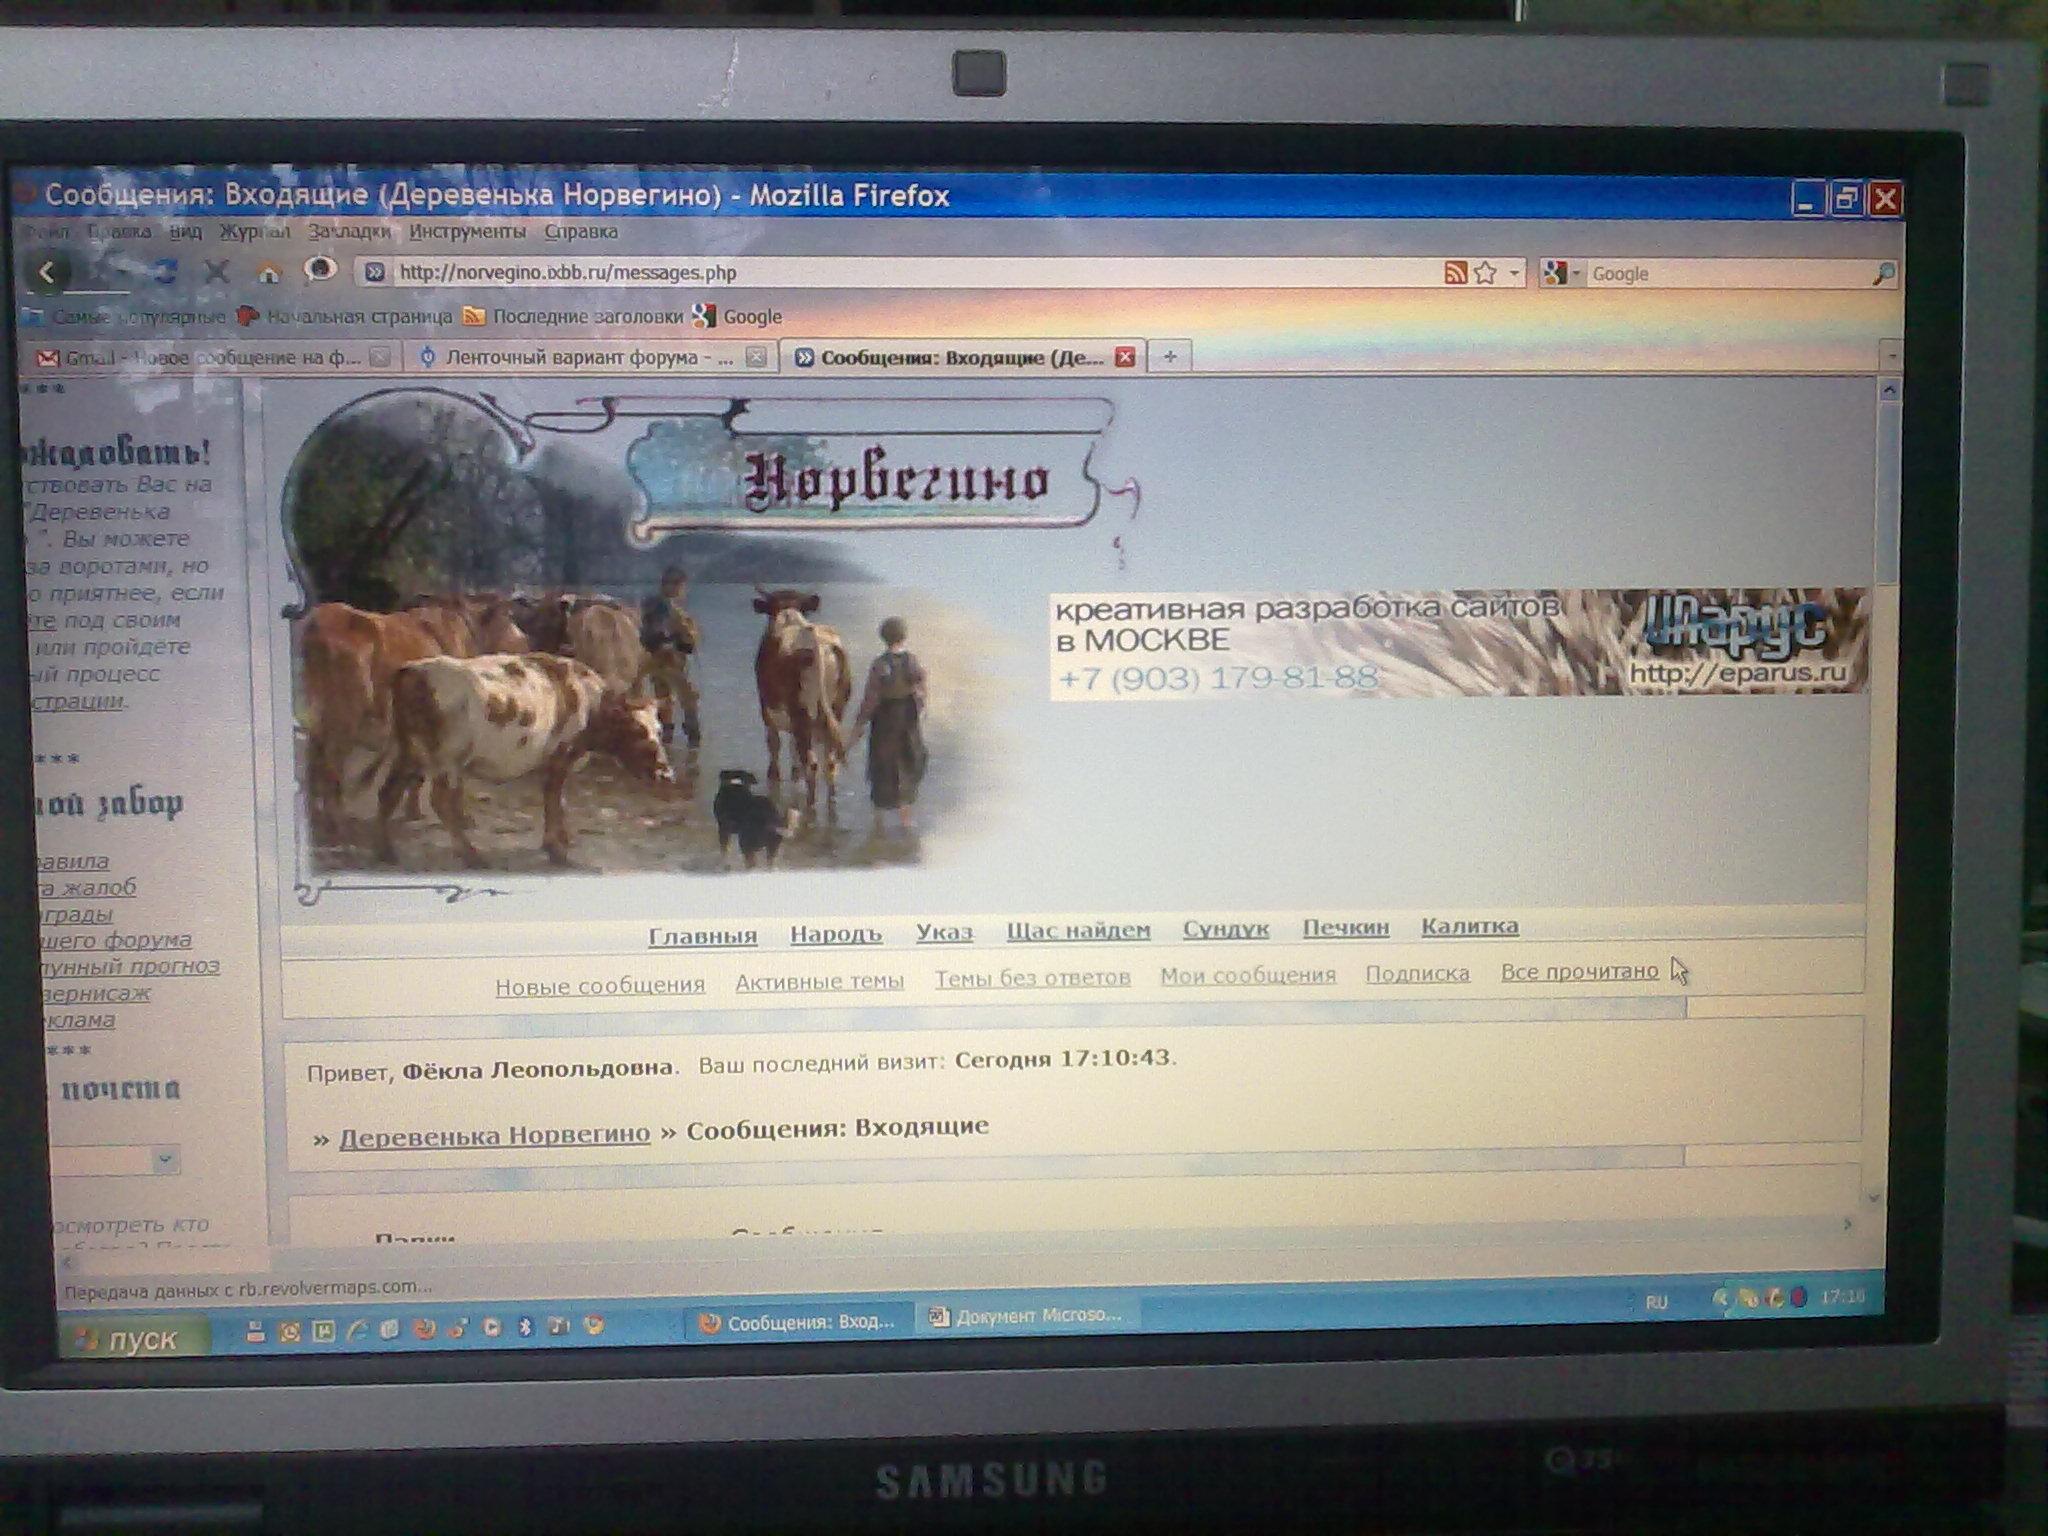 http://forumupload.ru/uploads/0007/5b/38/15357-1-f.jpg